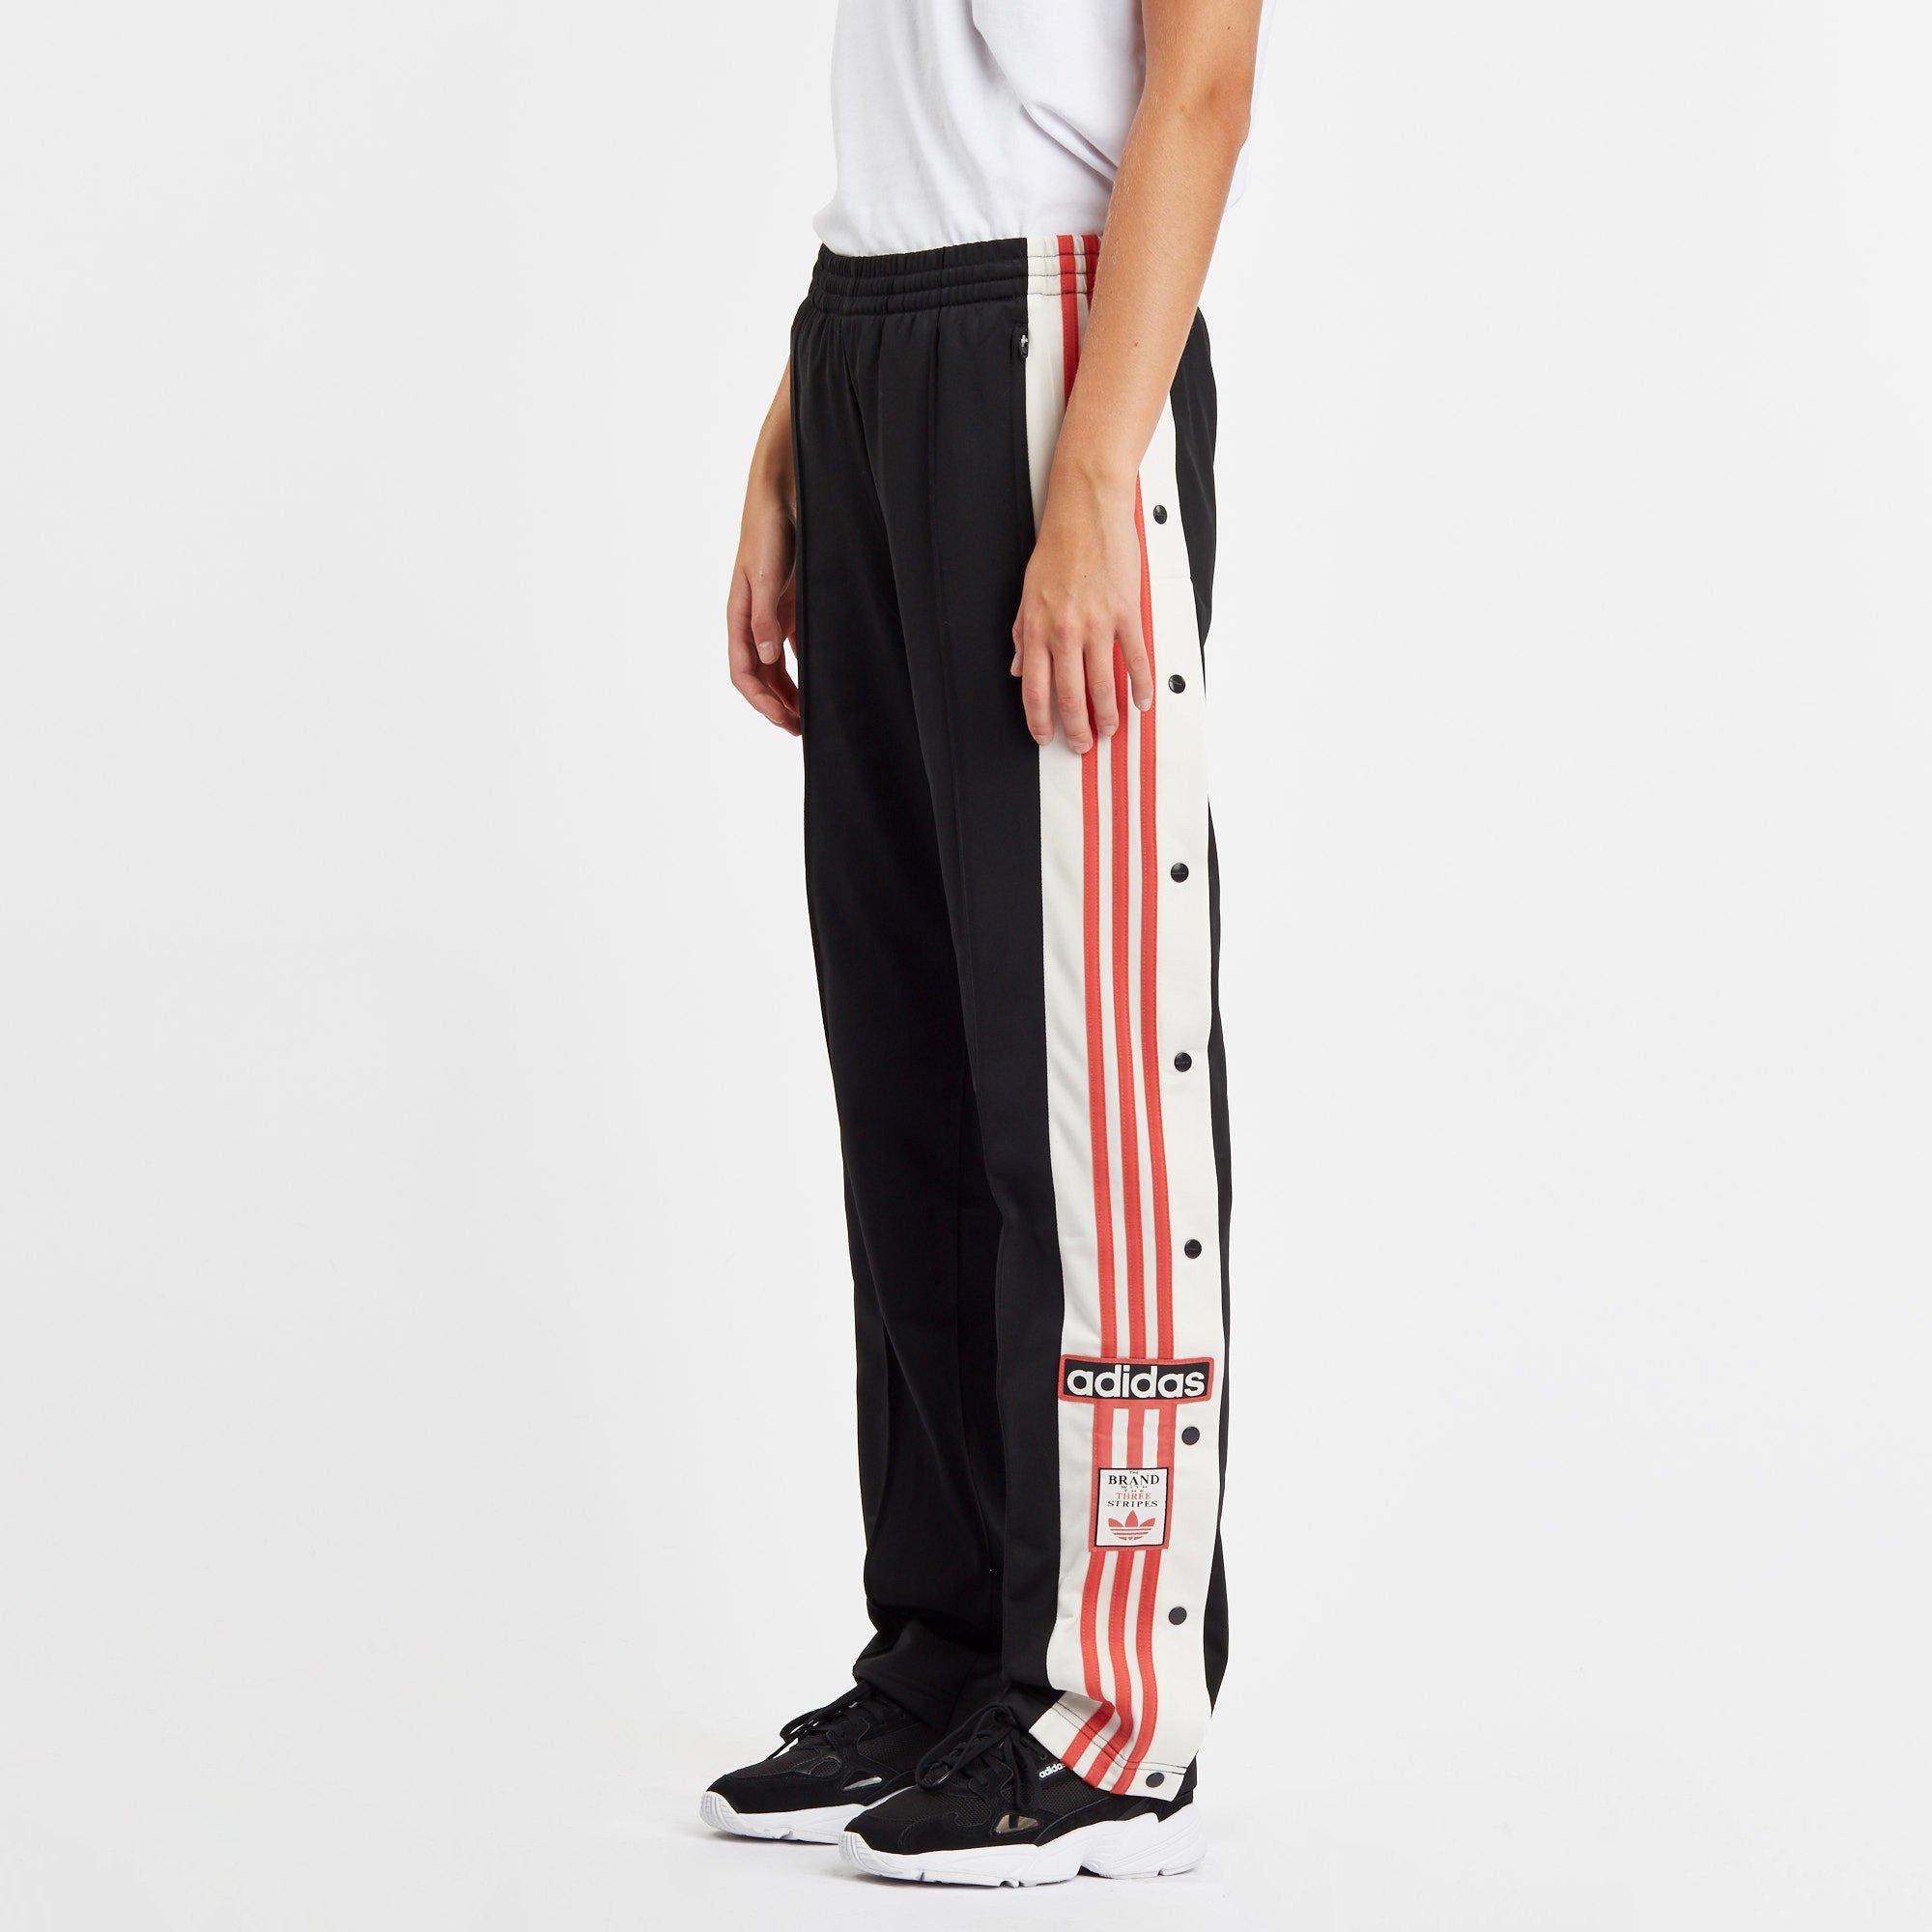 f4d4e33c046022 adidas OG Adibreak Track Pants - Dh4677 - Sneakersnstuff I Sneakers ...